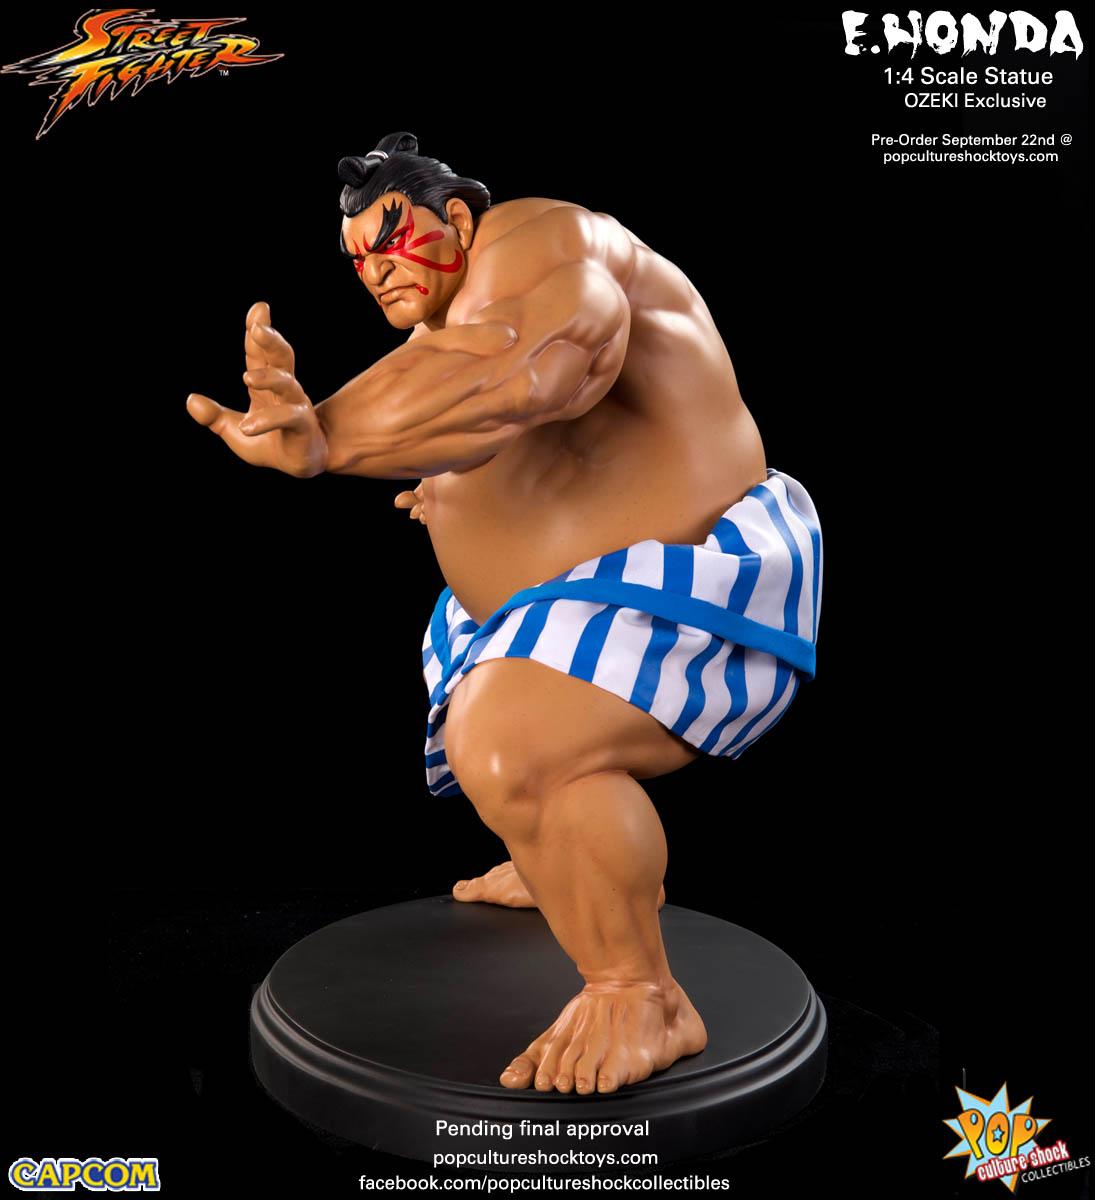 [Pop Culture Shock] Street Fighter: E. Honda 1/4 Statue - Página 3 Street-Fighter-E.-Honda-ozeki-Statue-010